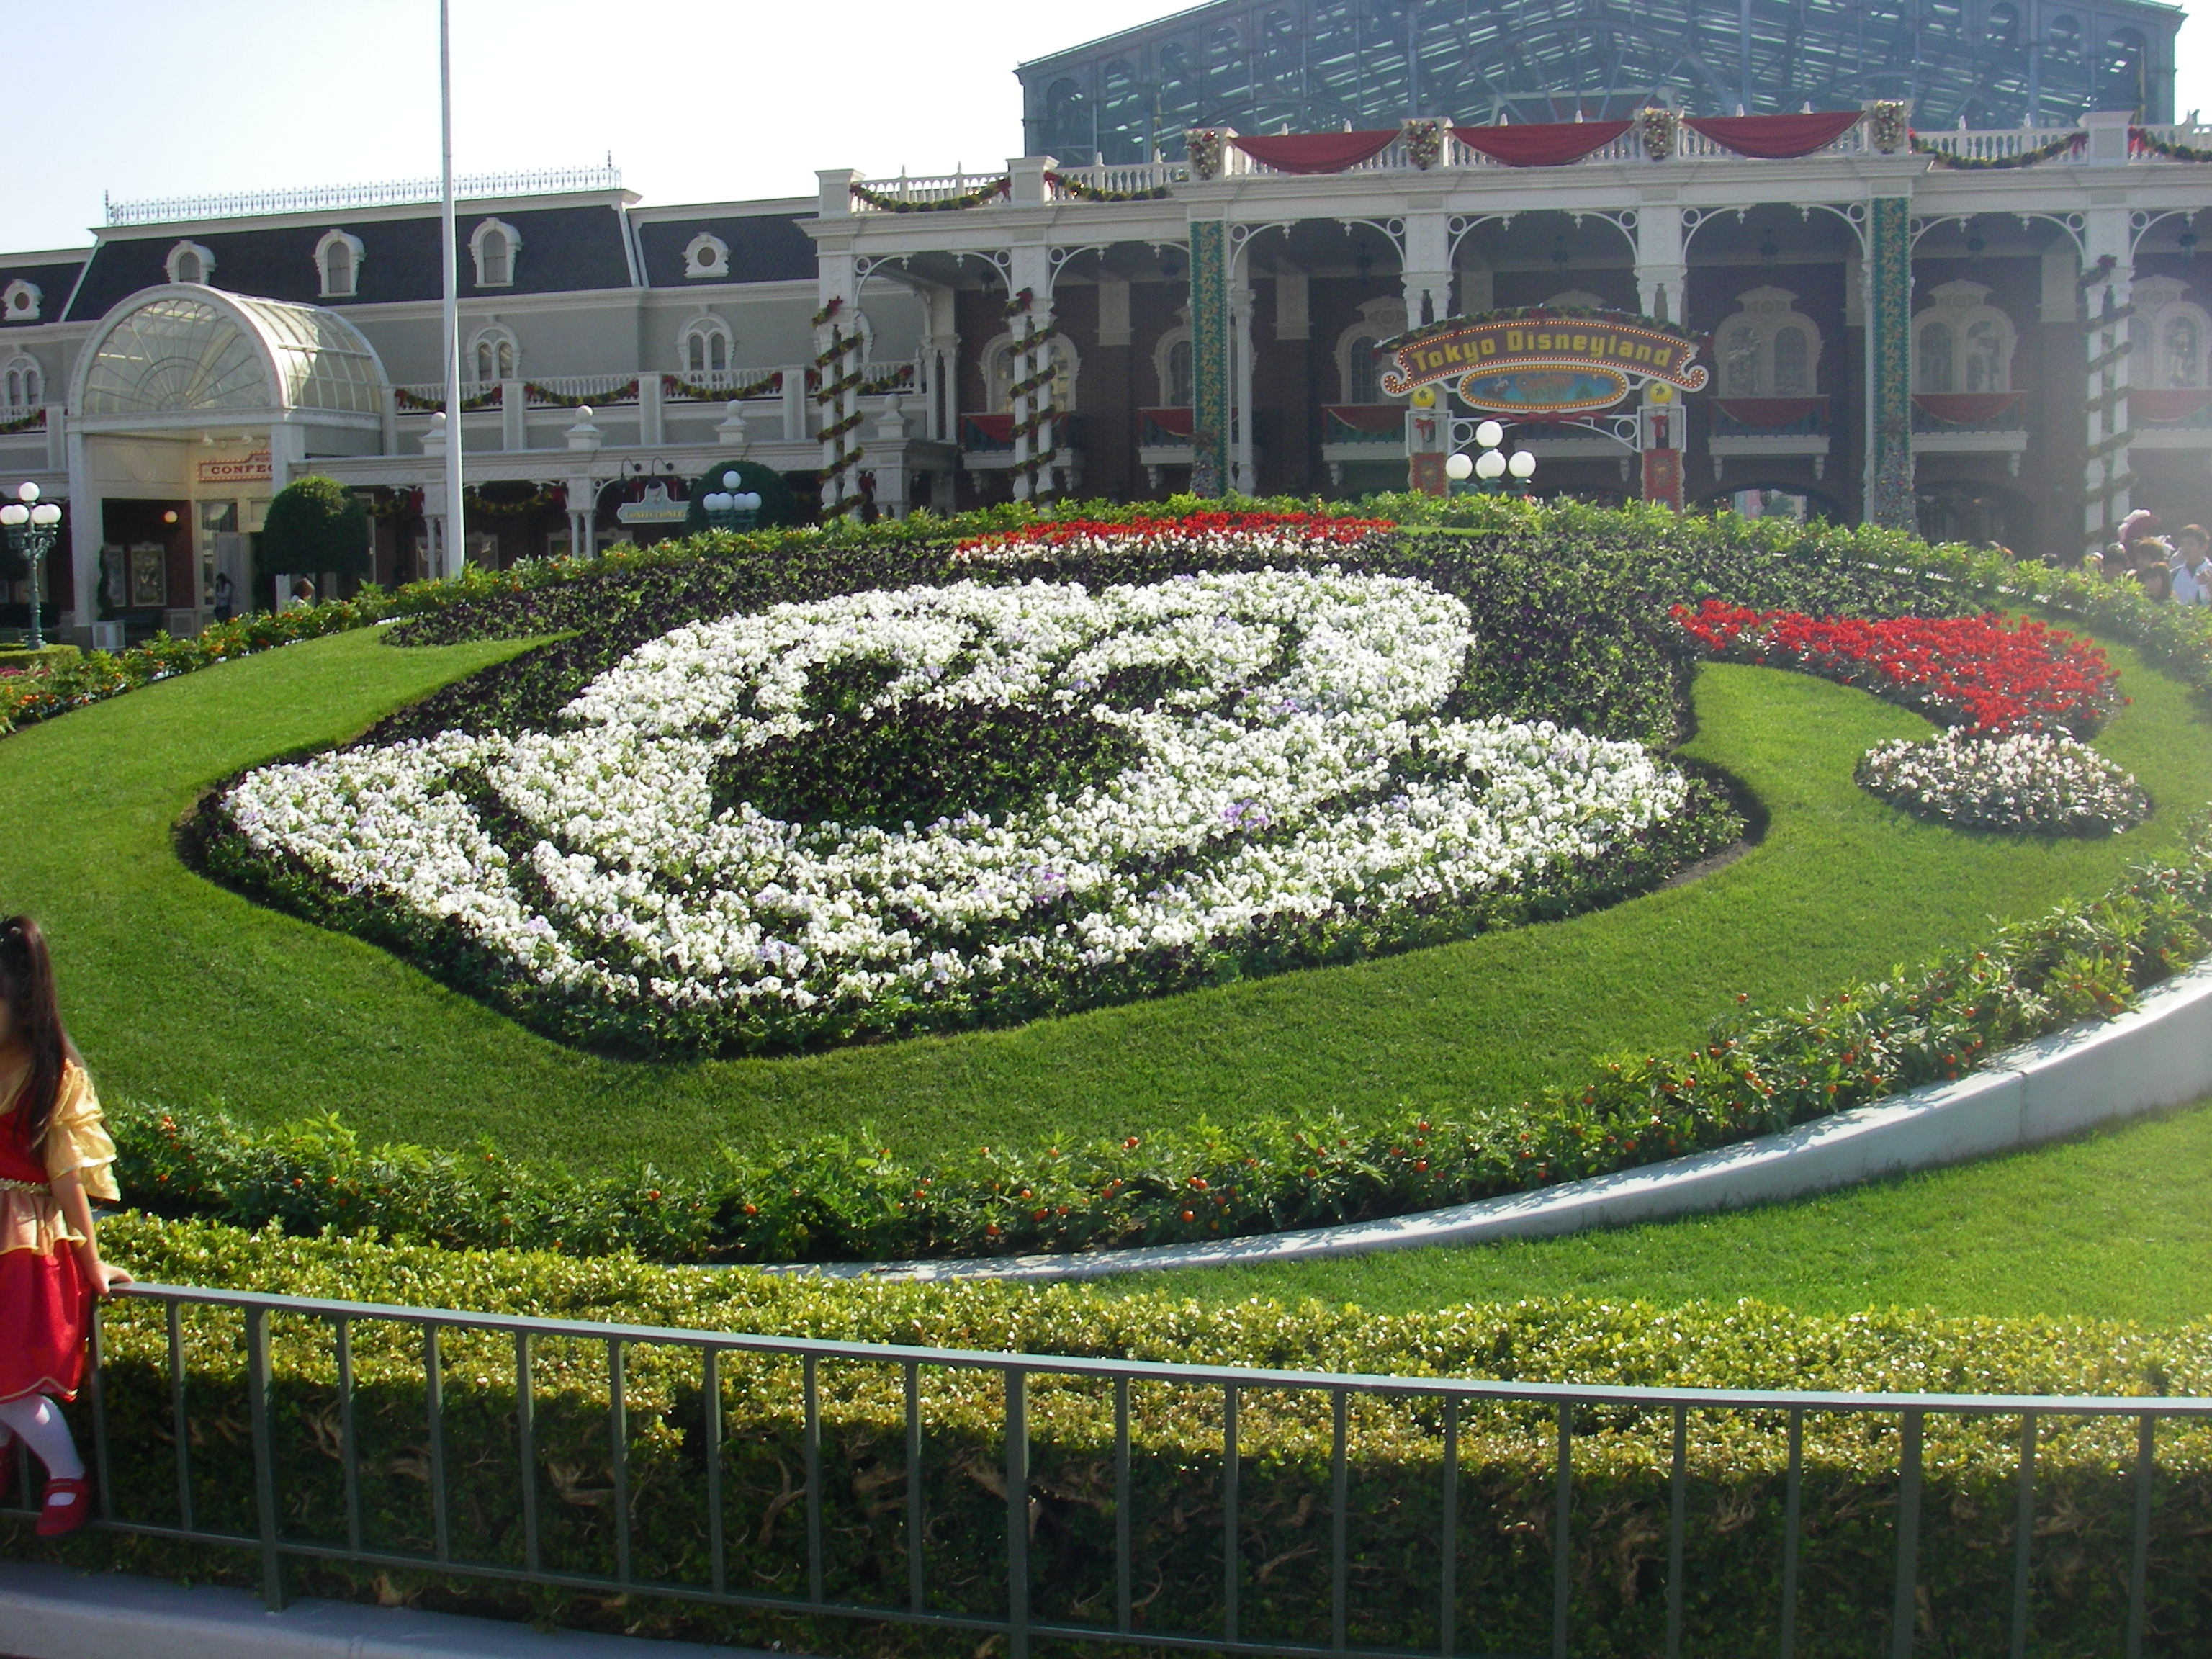 tdrとオフィシャルホテル』東京ディズニーリゾート(千葉県)の旅行記